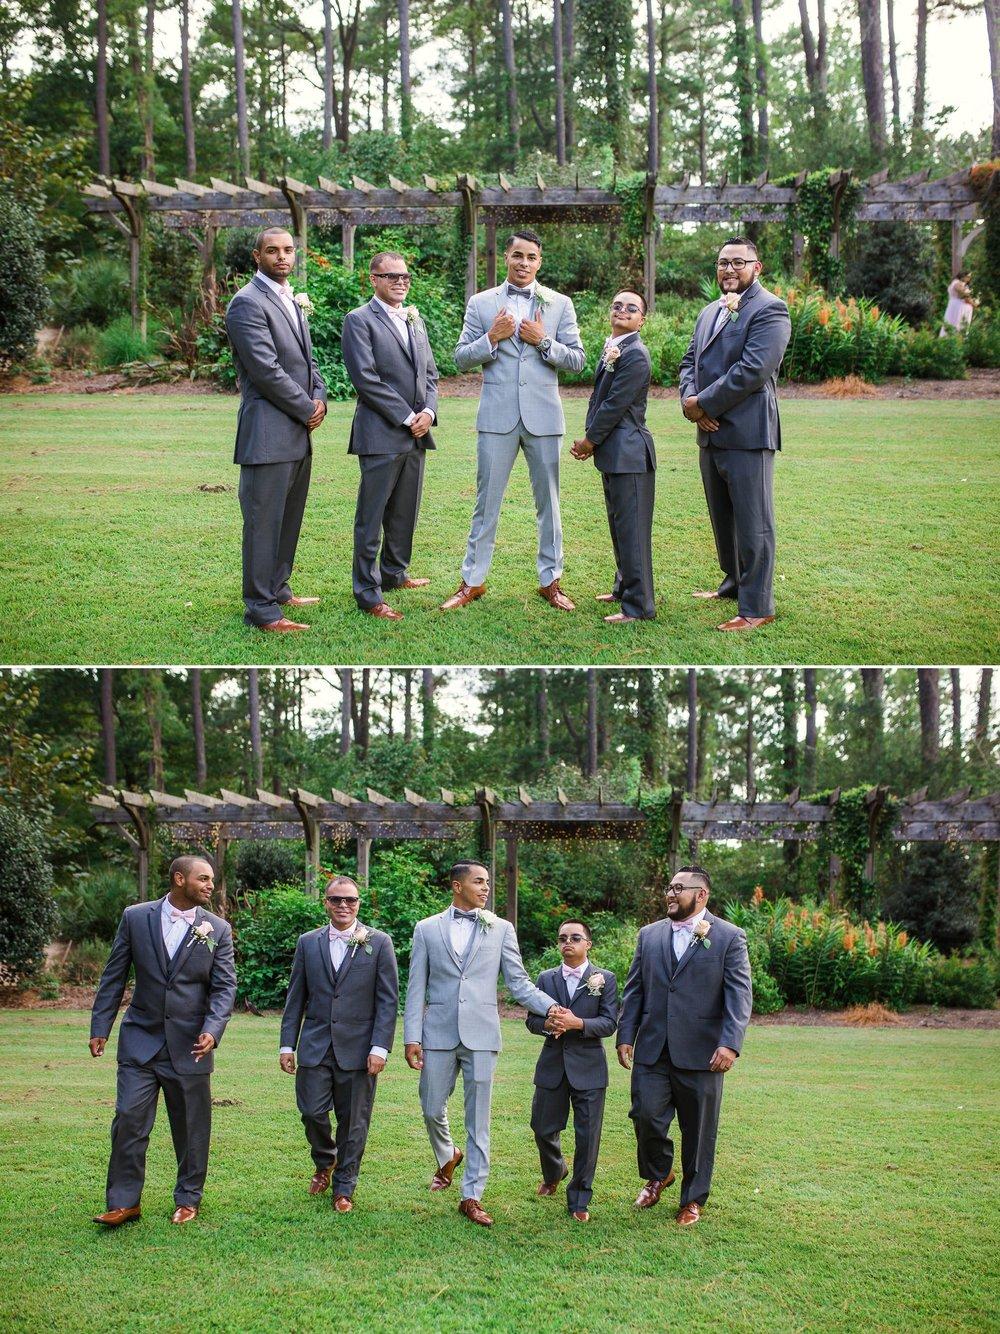 Groomsmen Portraits - Yansi + Eddie - Wedding at Cape Fear Botanical Garden - Fayetteville North Carolina Photographer